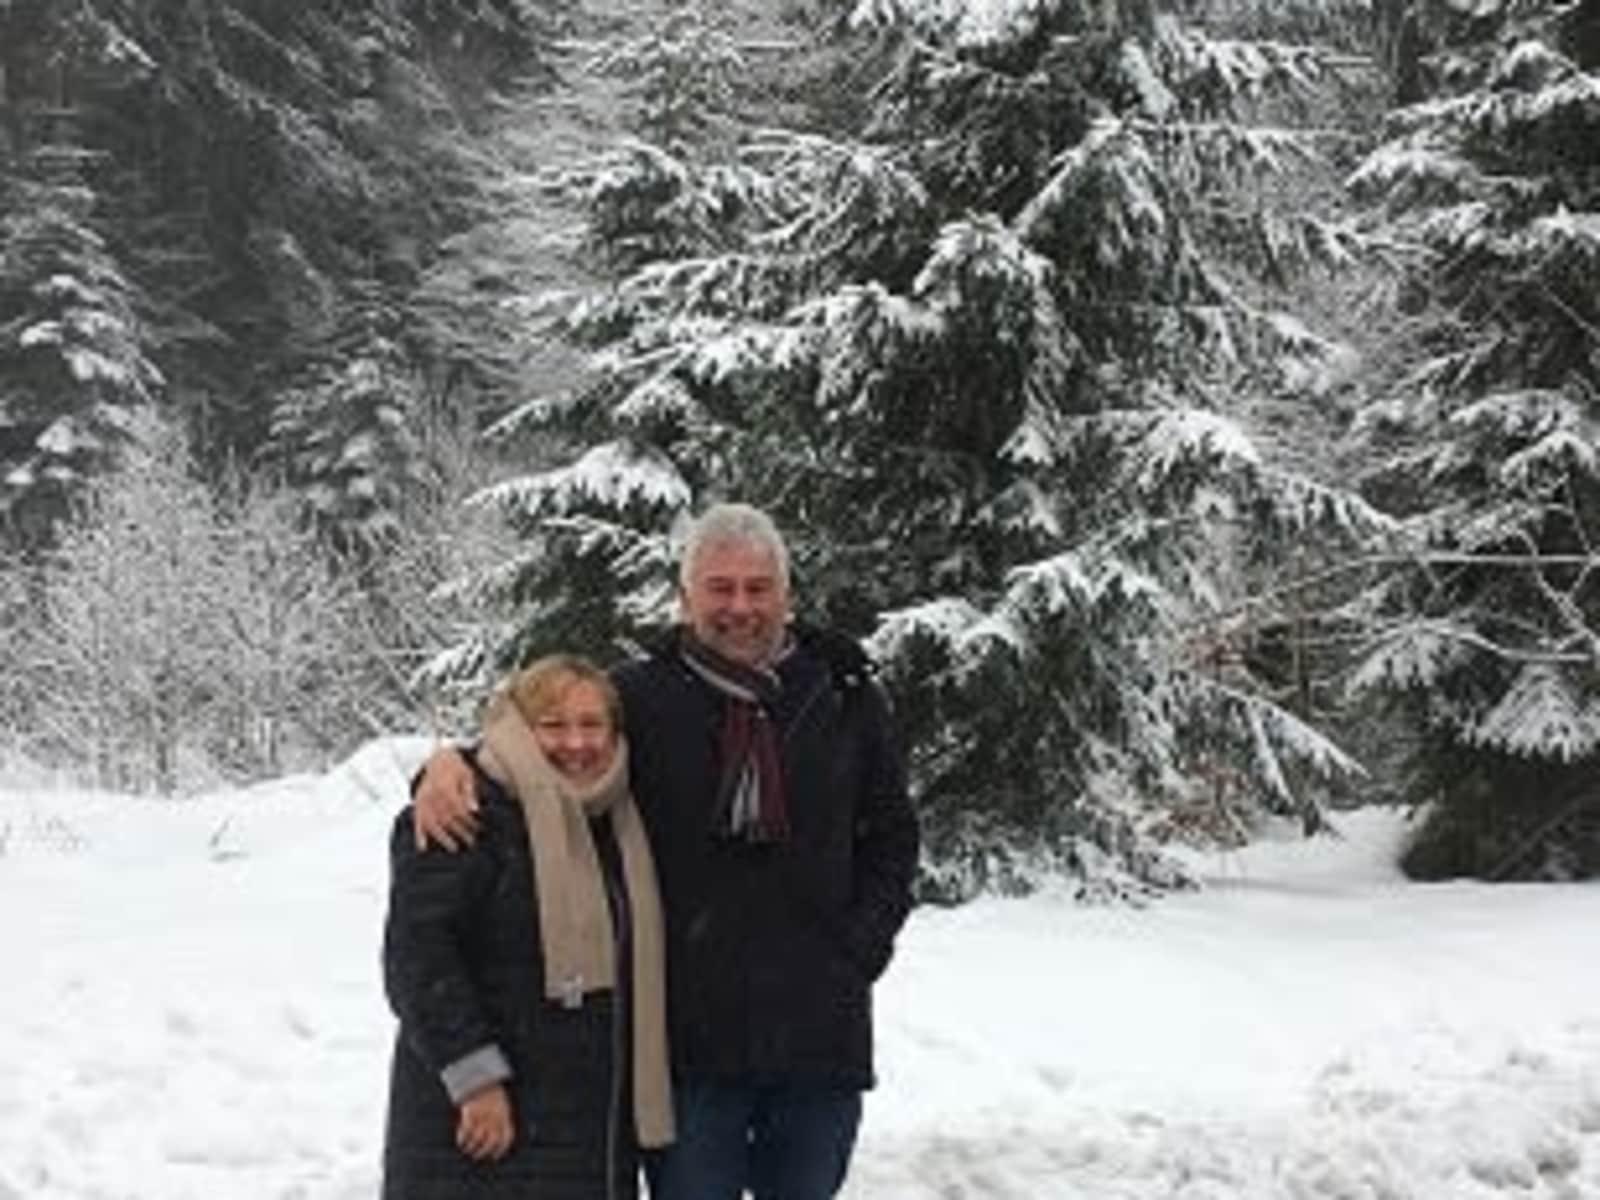 Carol & Paul from Adelaide, South Australia, Australia